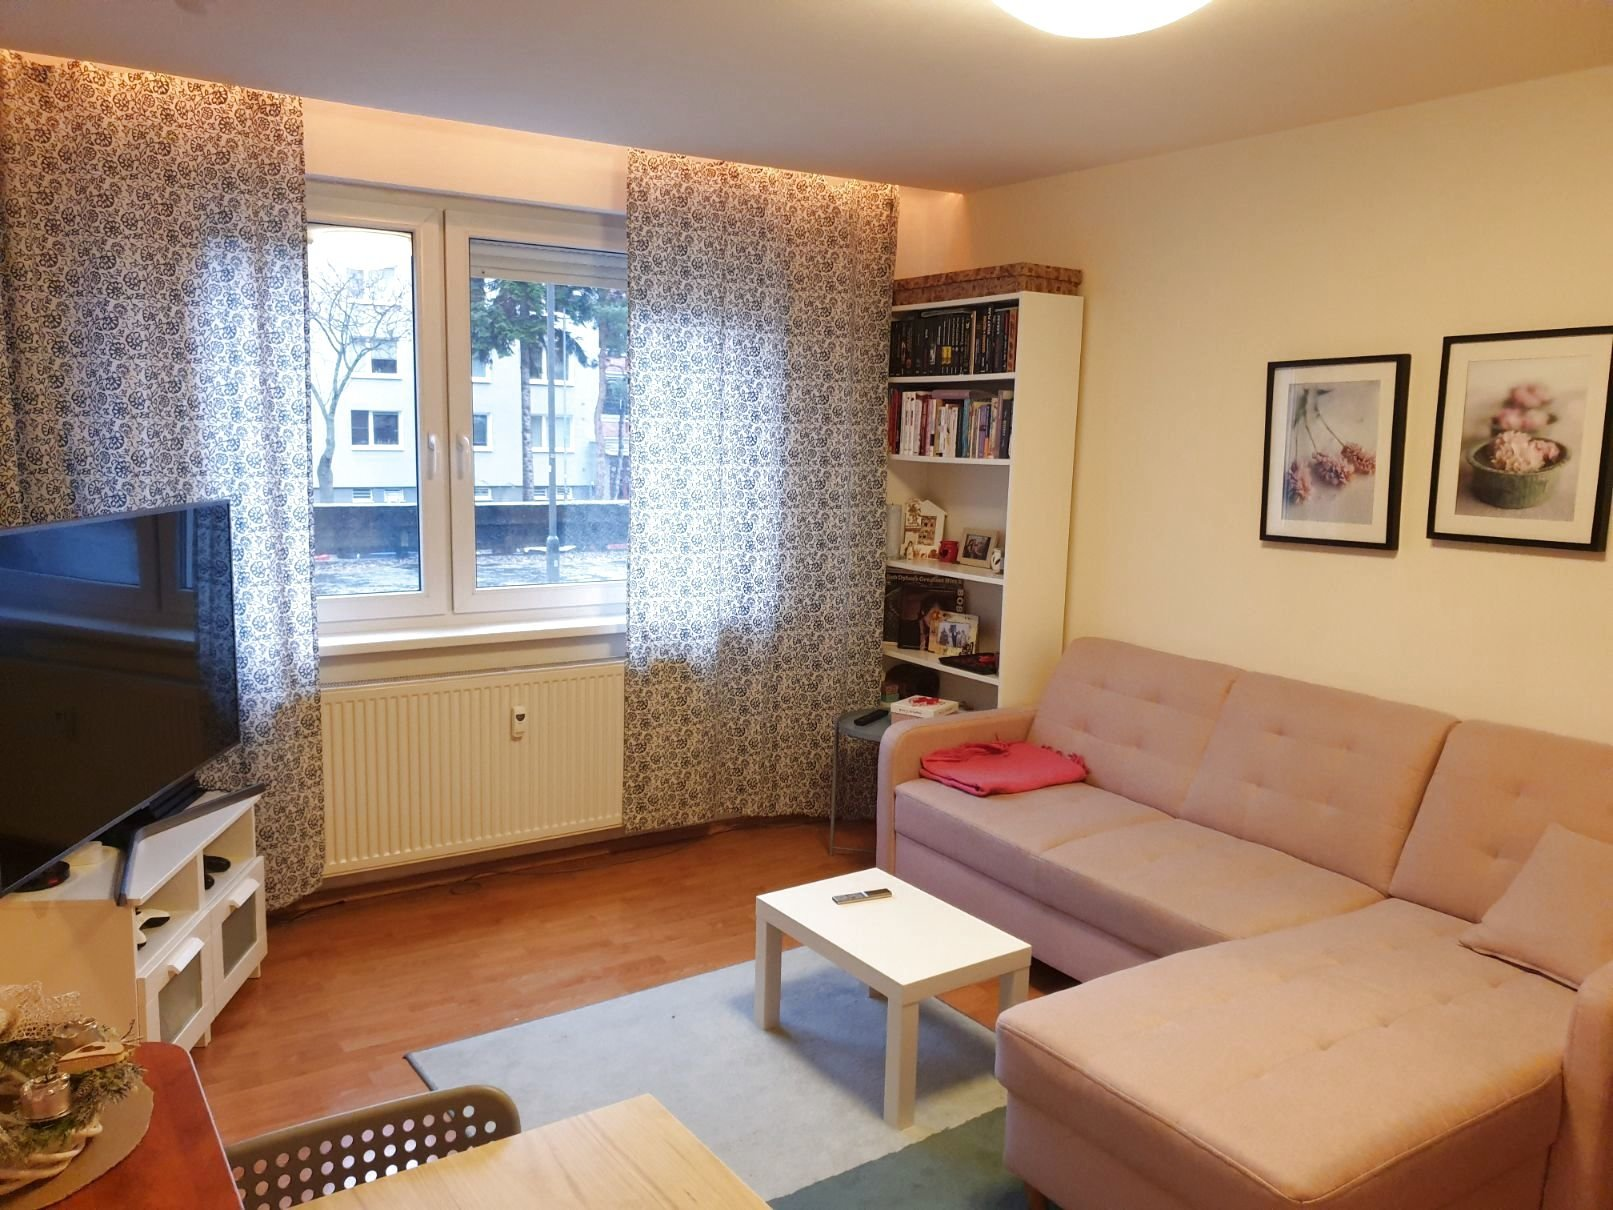 2 – izbovy Muškátová ulica – Bratislava